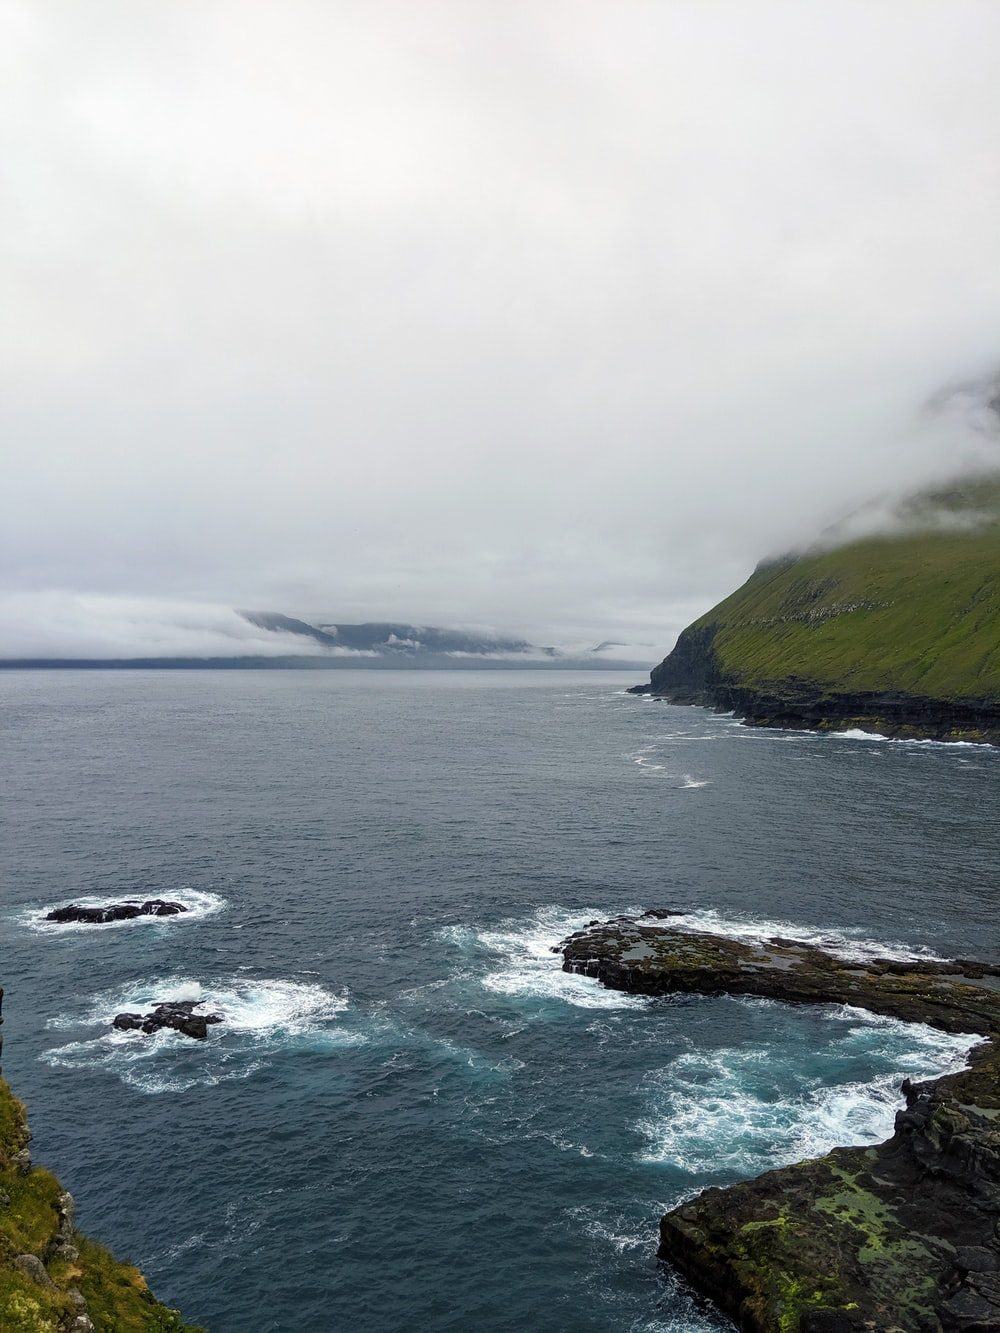 seashore rocks during cloudy day